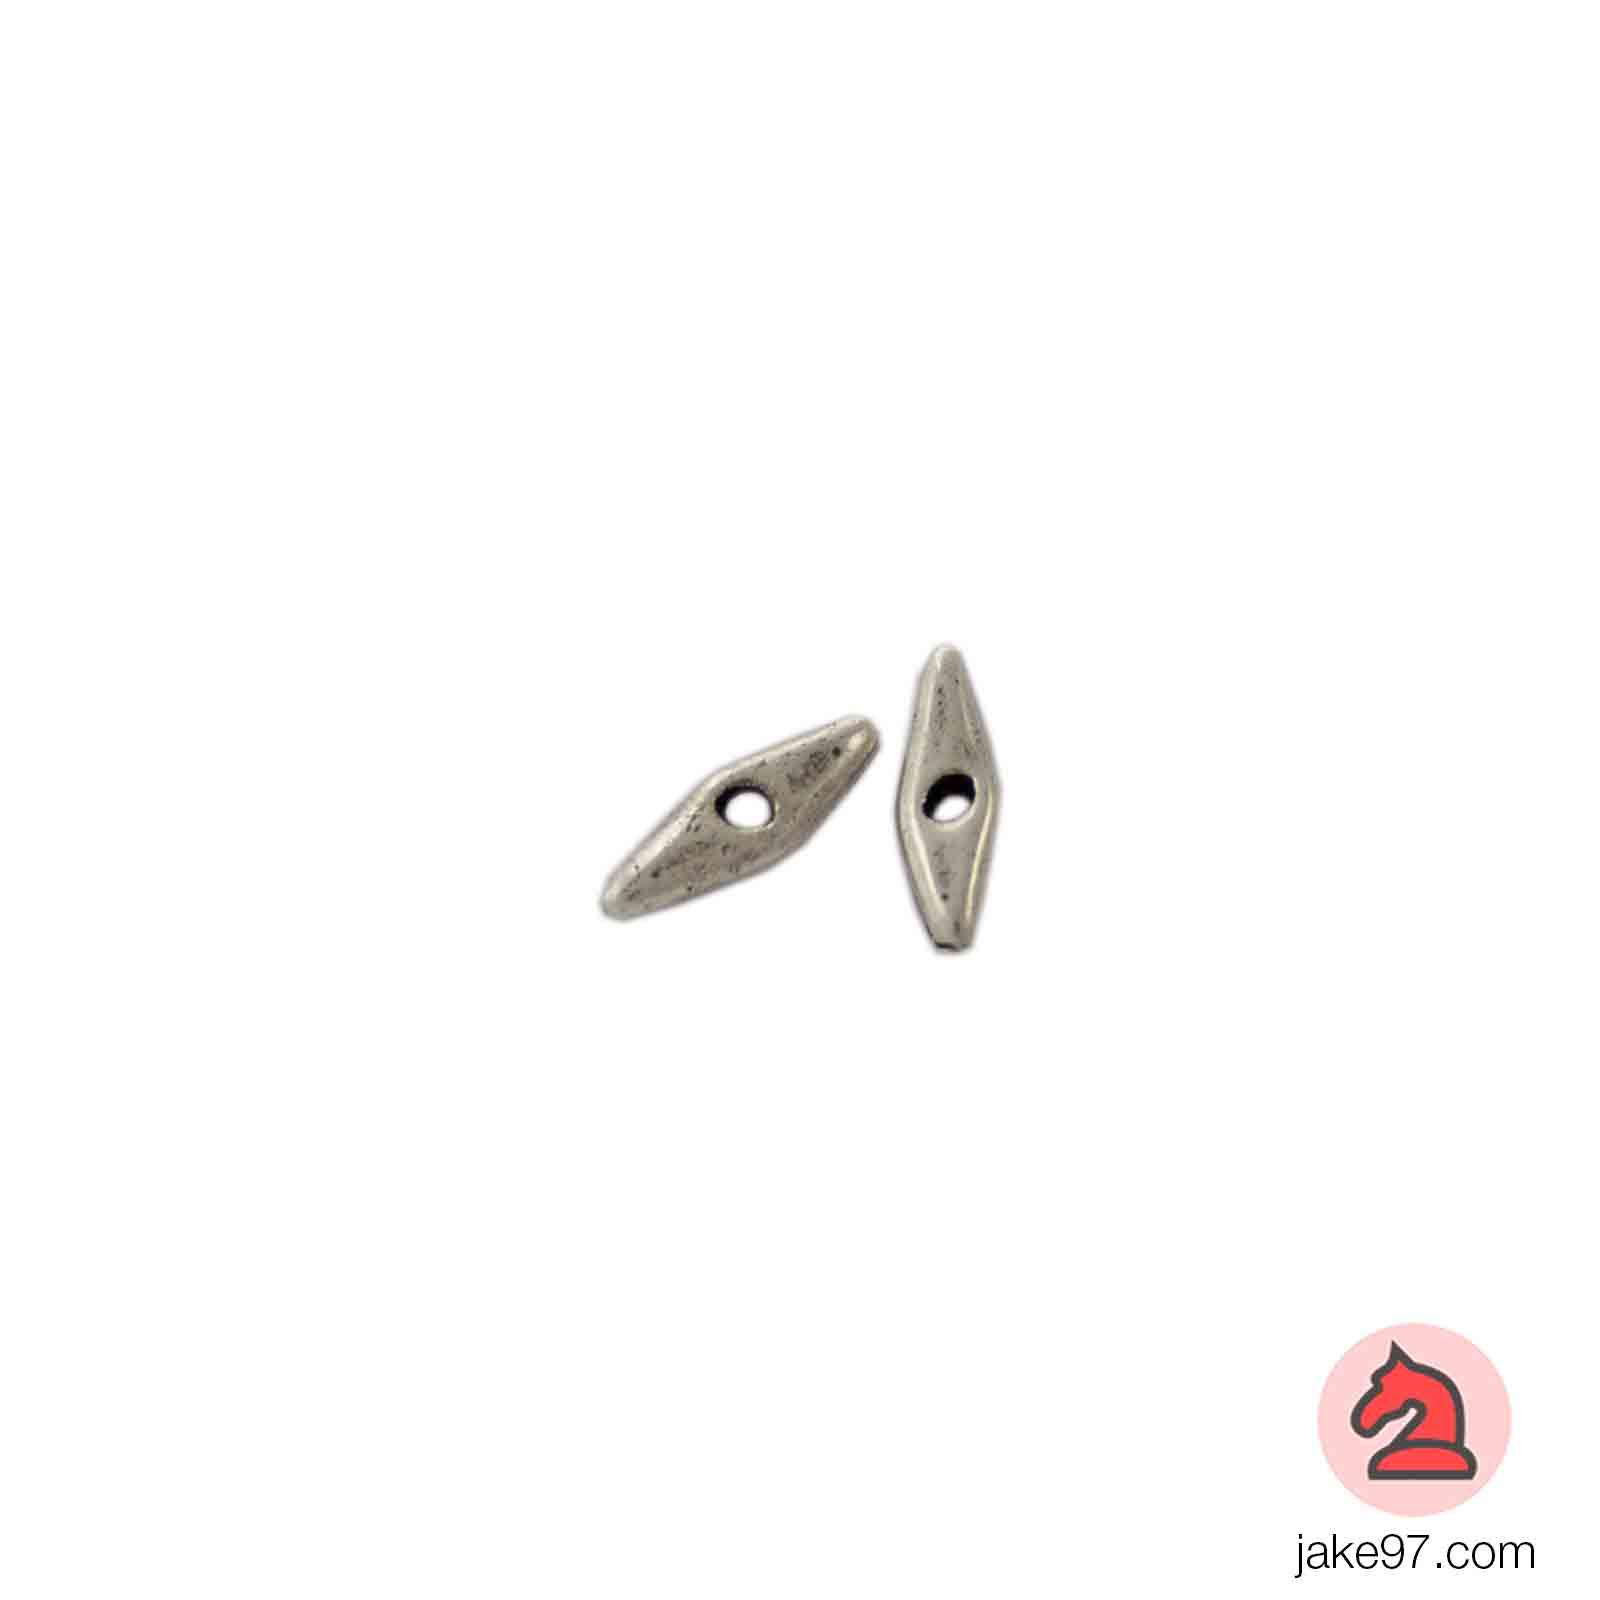 Lágrima Mediana - Paquete de 30 unidades Tamaño apróx 19X5 mm, taladro 2mm